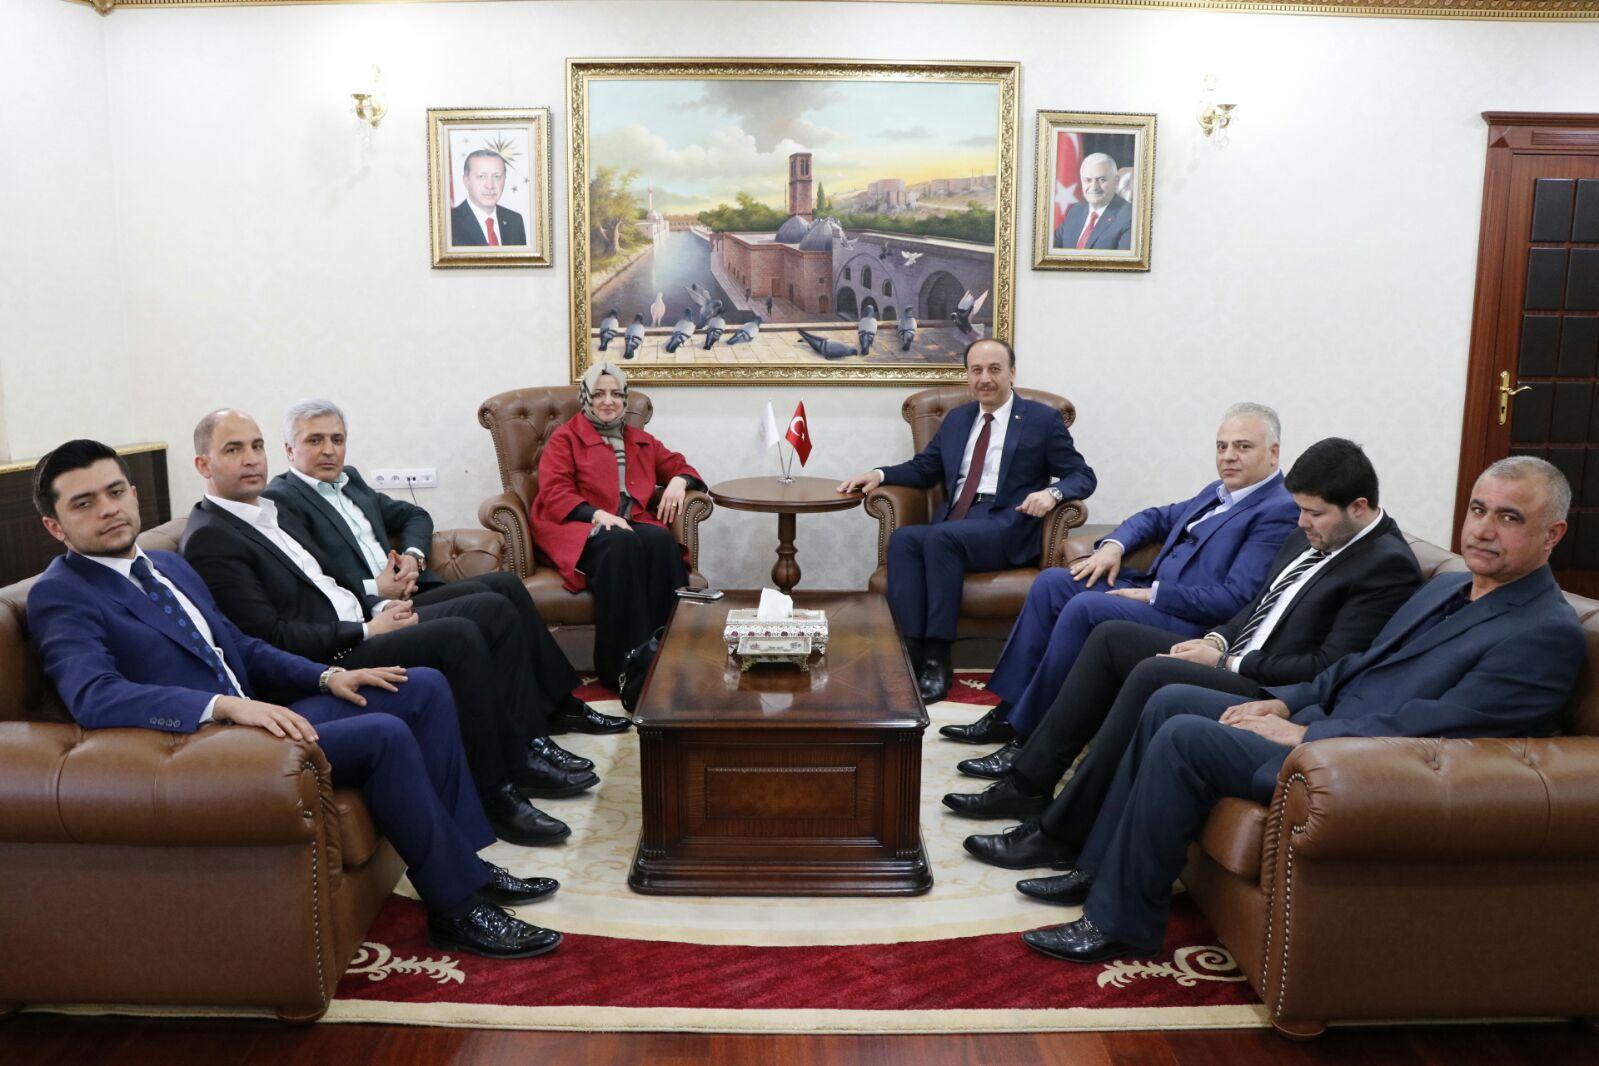 Baş Danışman Gülşen Orhan  Urfa'yı ziyaret etti